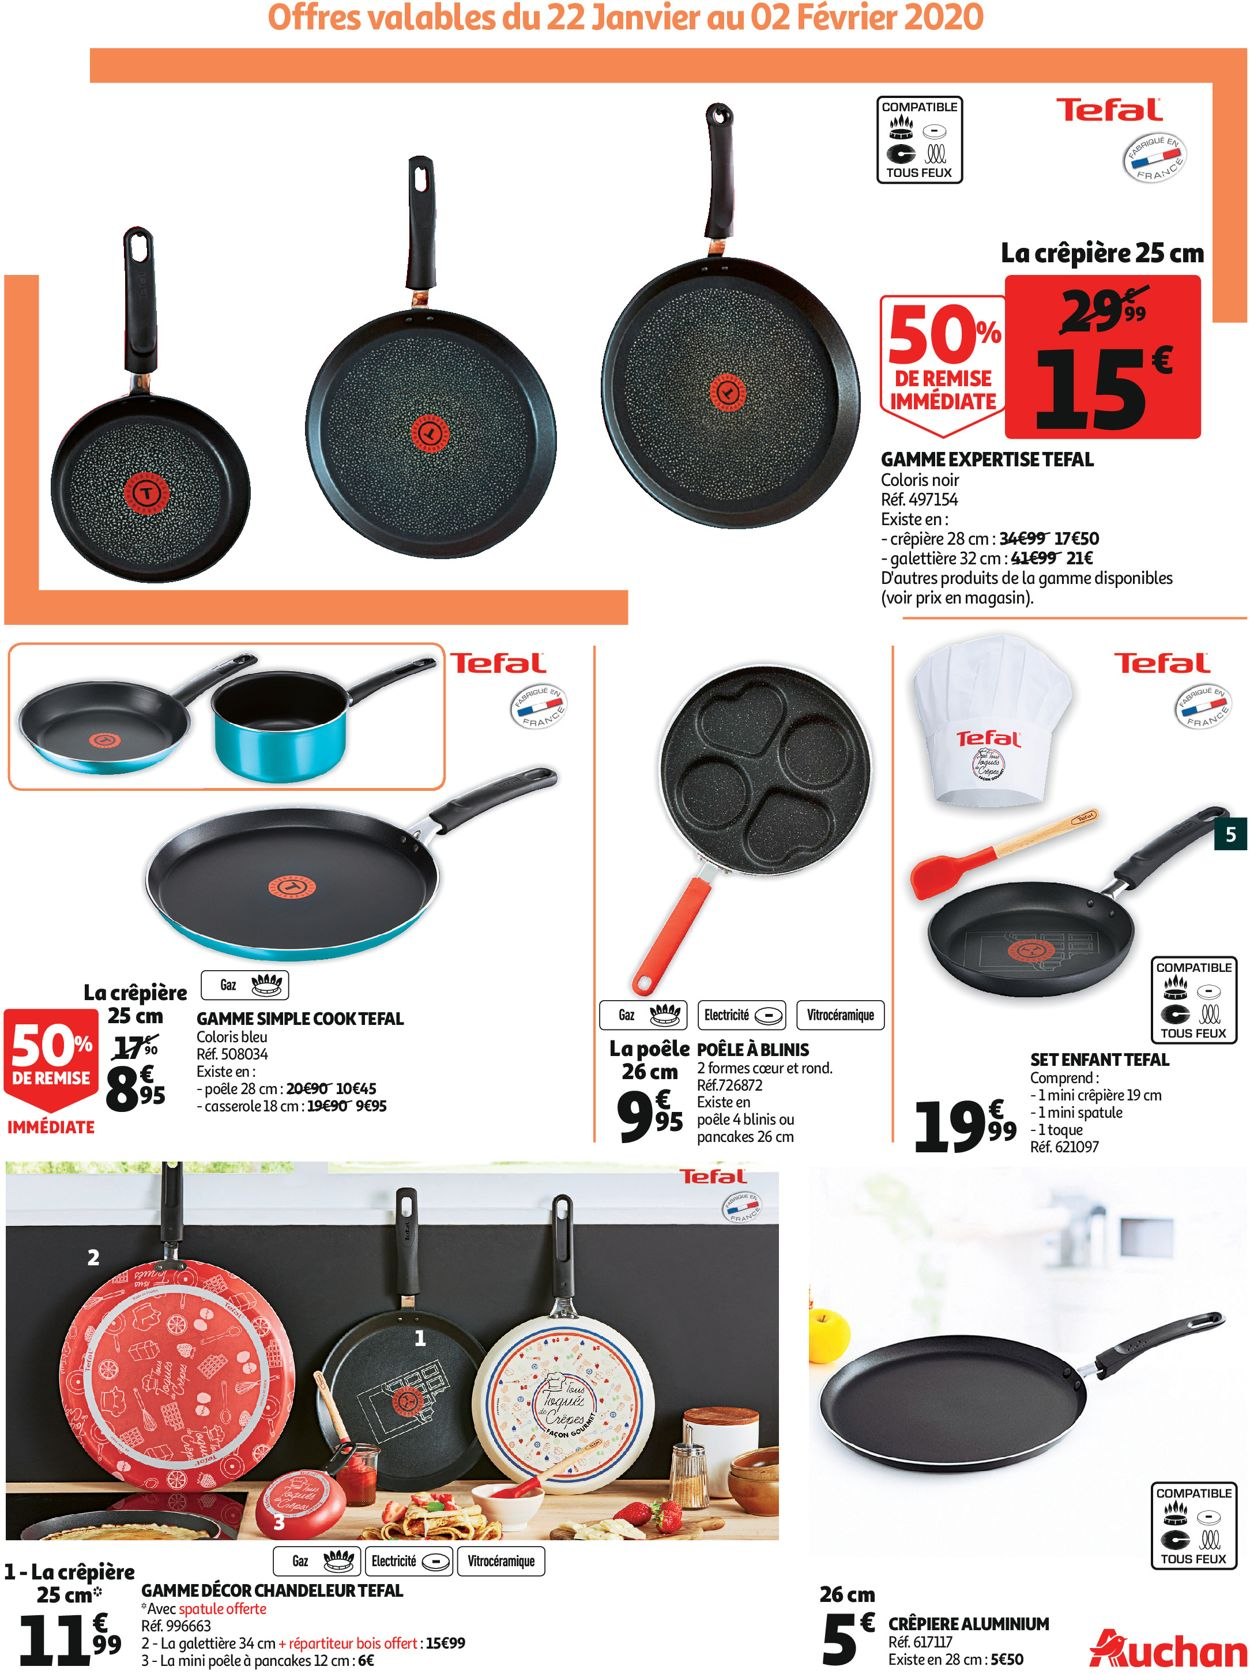 Auchan Catalogue - 22.01-28.01.2020 (Page 5)